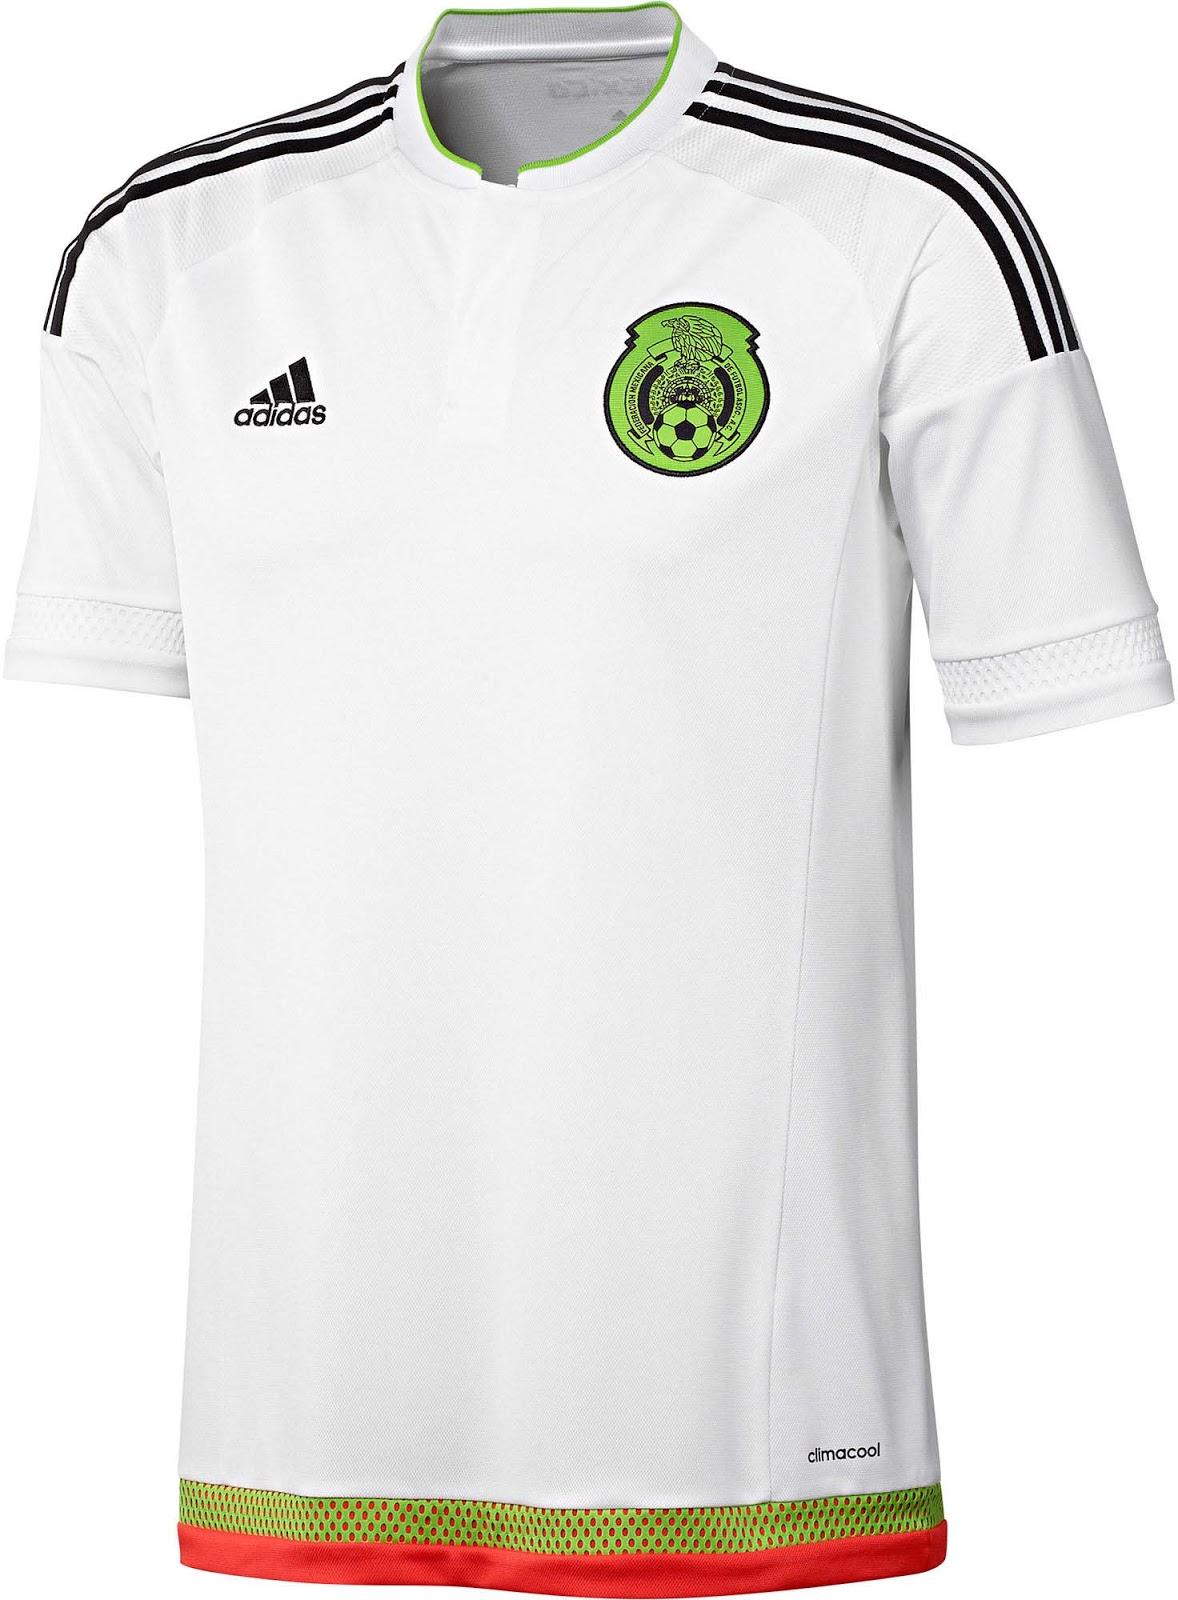 promo code e22ed c3c61 Mexico National Team Jersey 2014 | RLDM